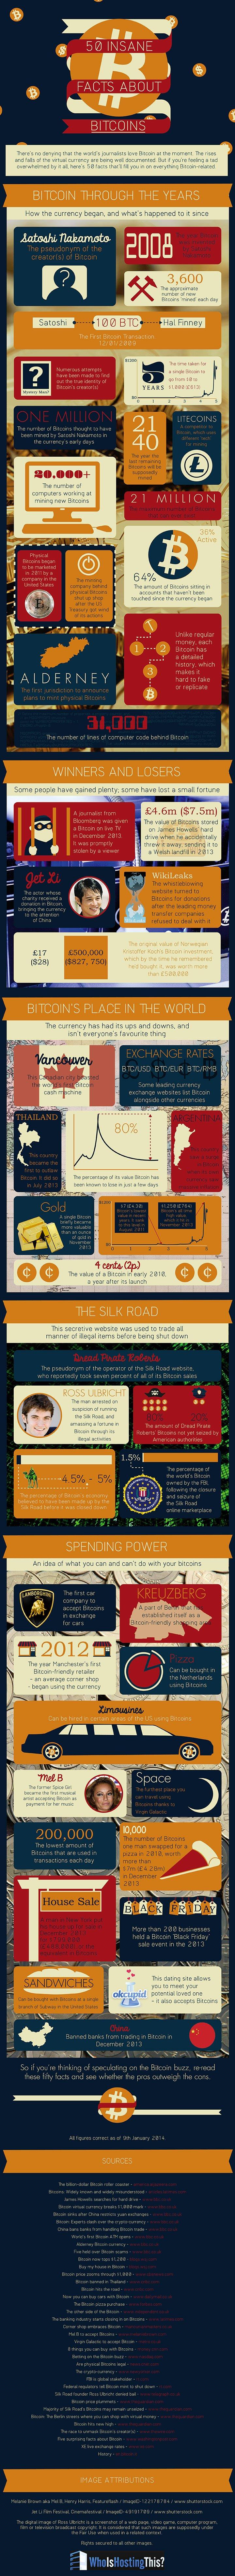 50-insane-facts-bitcoin-infographic.jpg